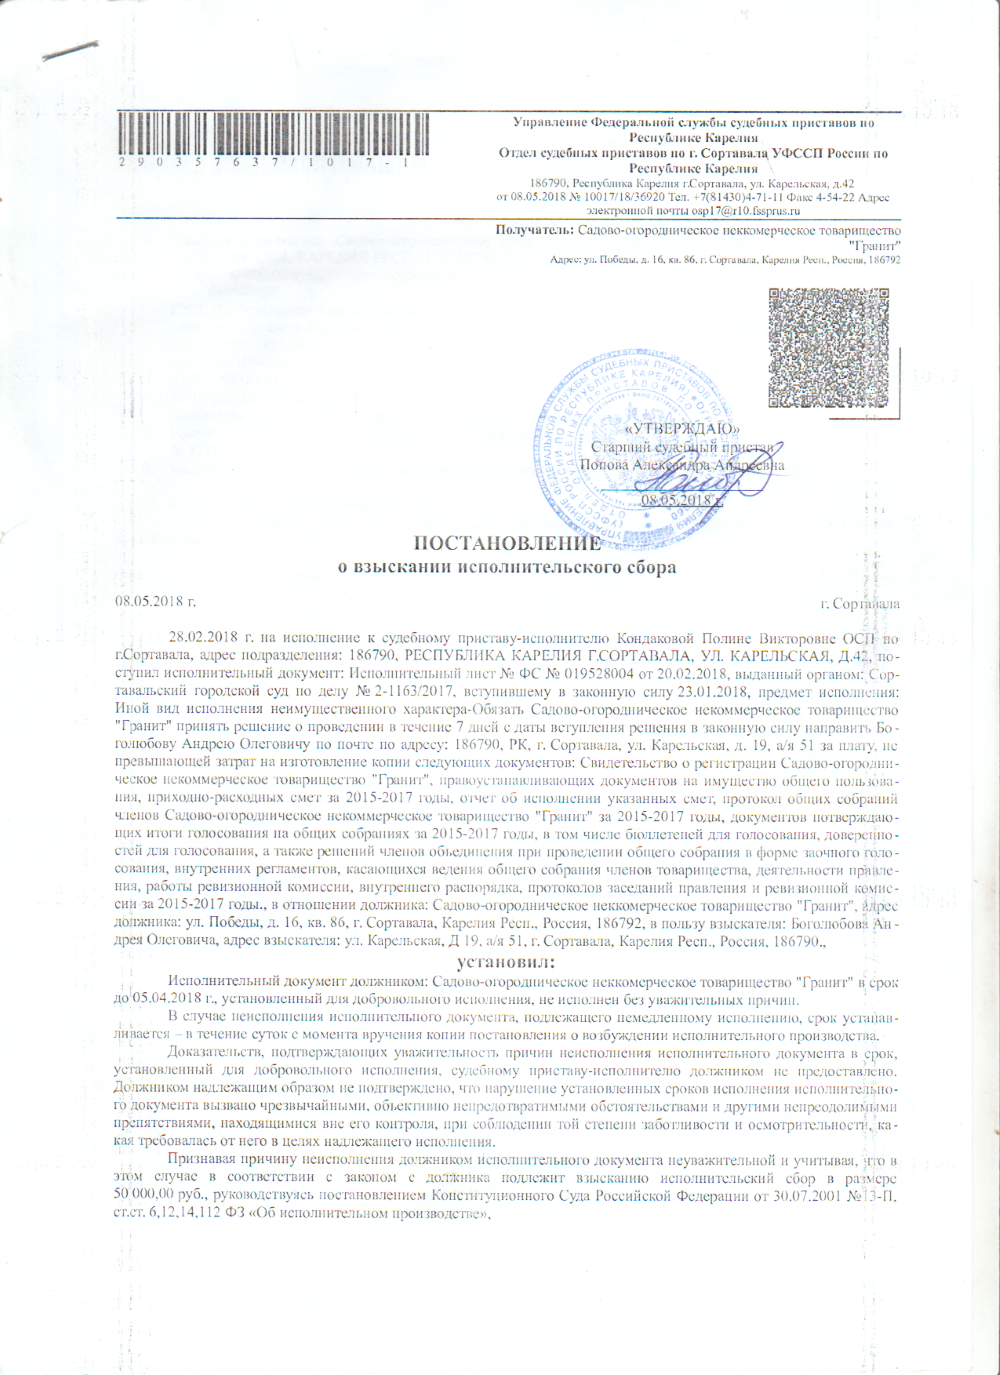 https://sontgranit.ru/forum/img/sokol/исп-сбор-50-1.png